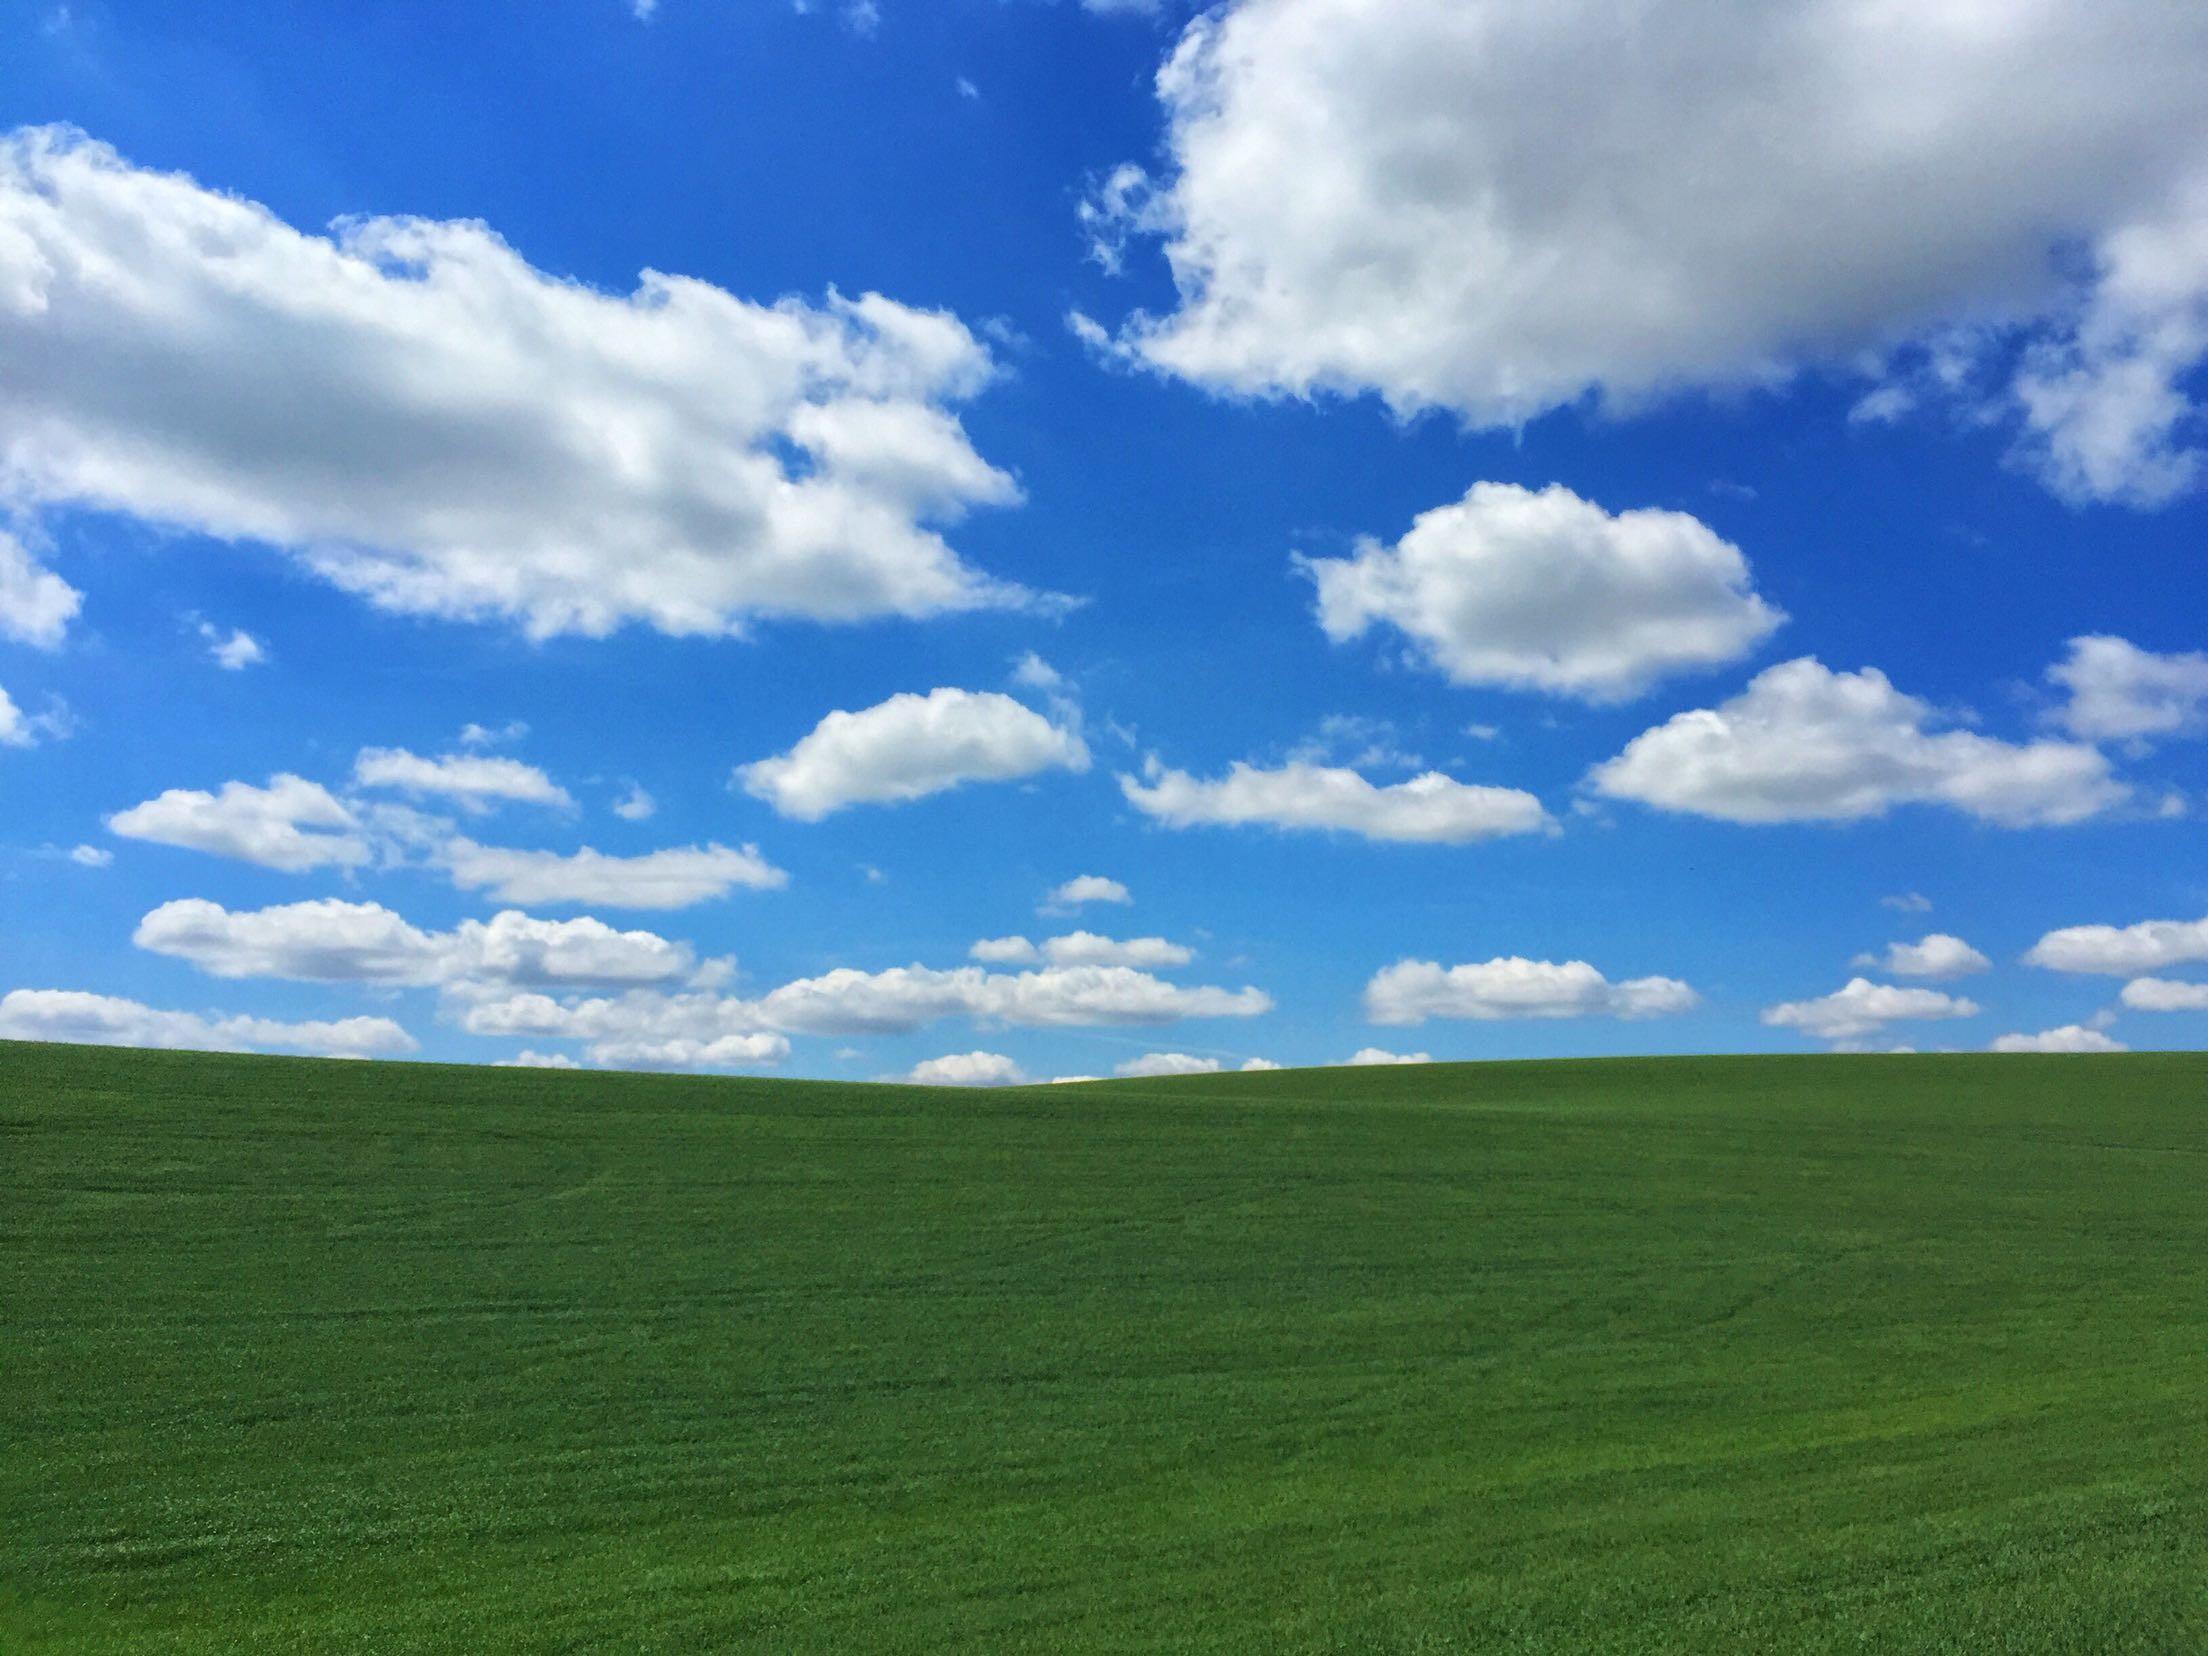 desktop wallpaper picture: Funny Windows Desktop Backgrounds (55+ Images